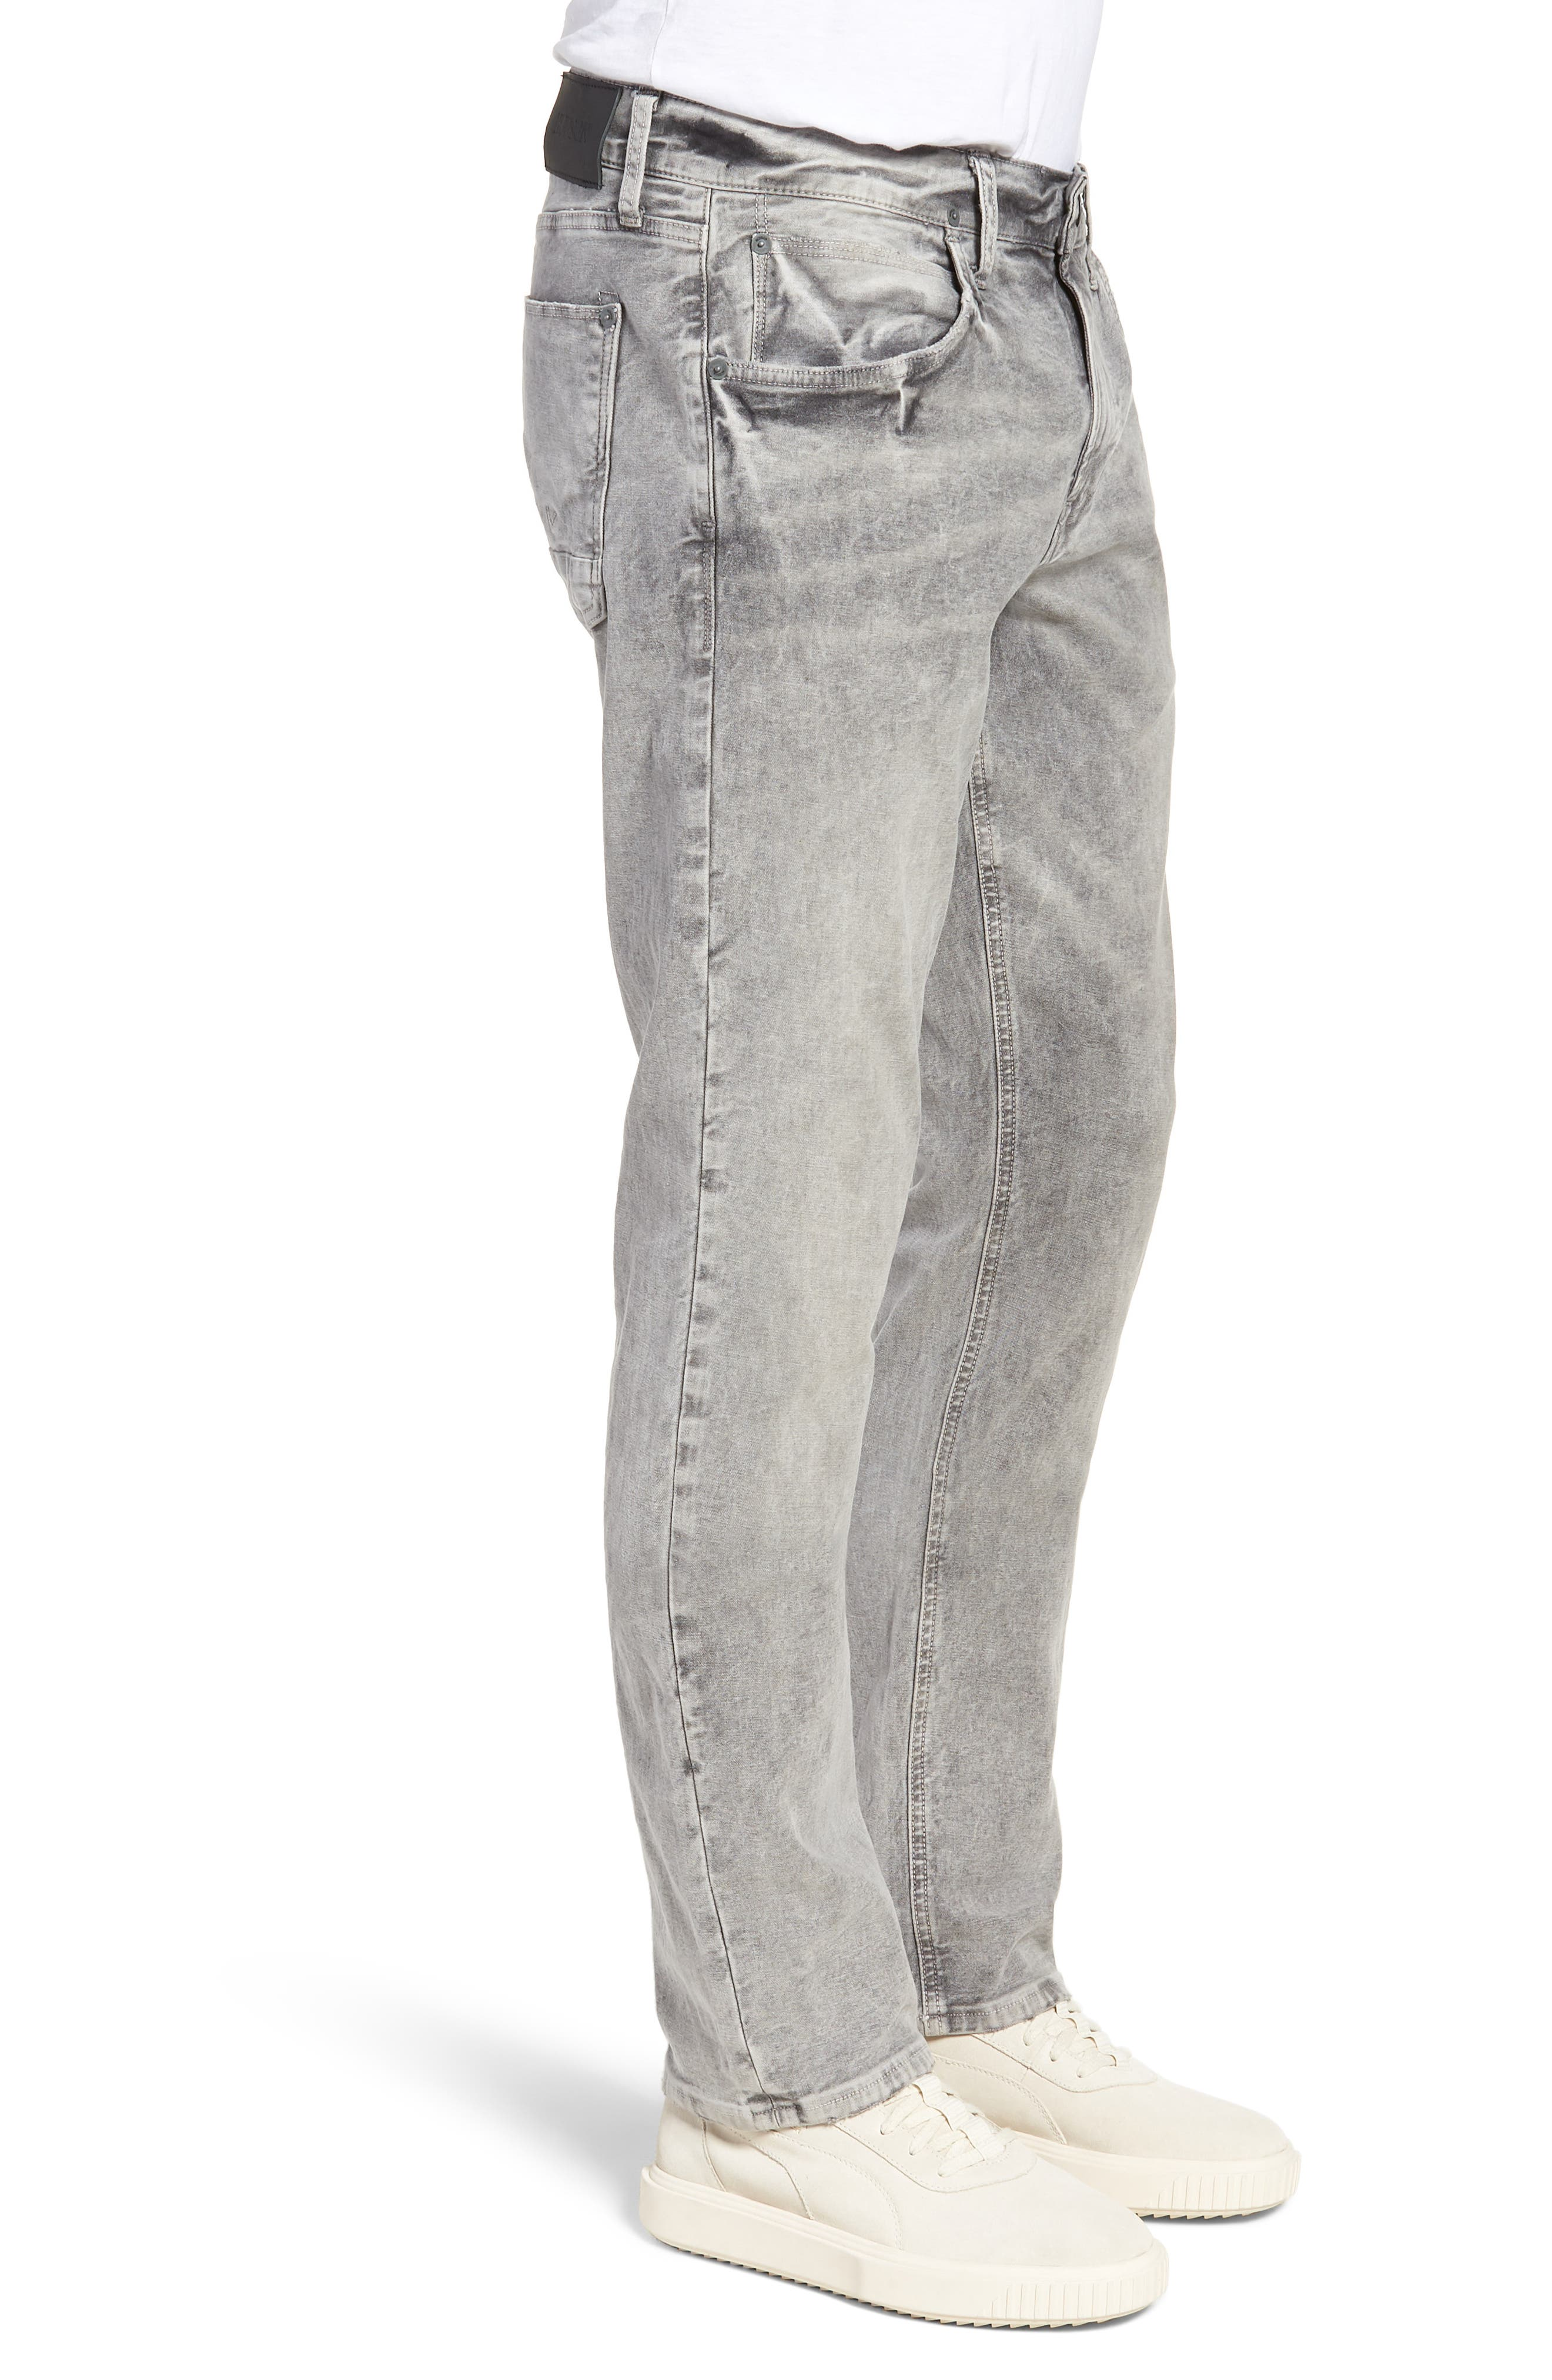 Blake Slim Fit Jeans,                             Alternate thumbnail 3, color,                             Deceiving